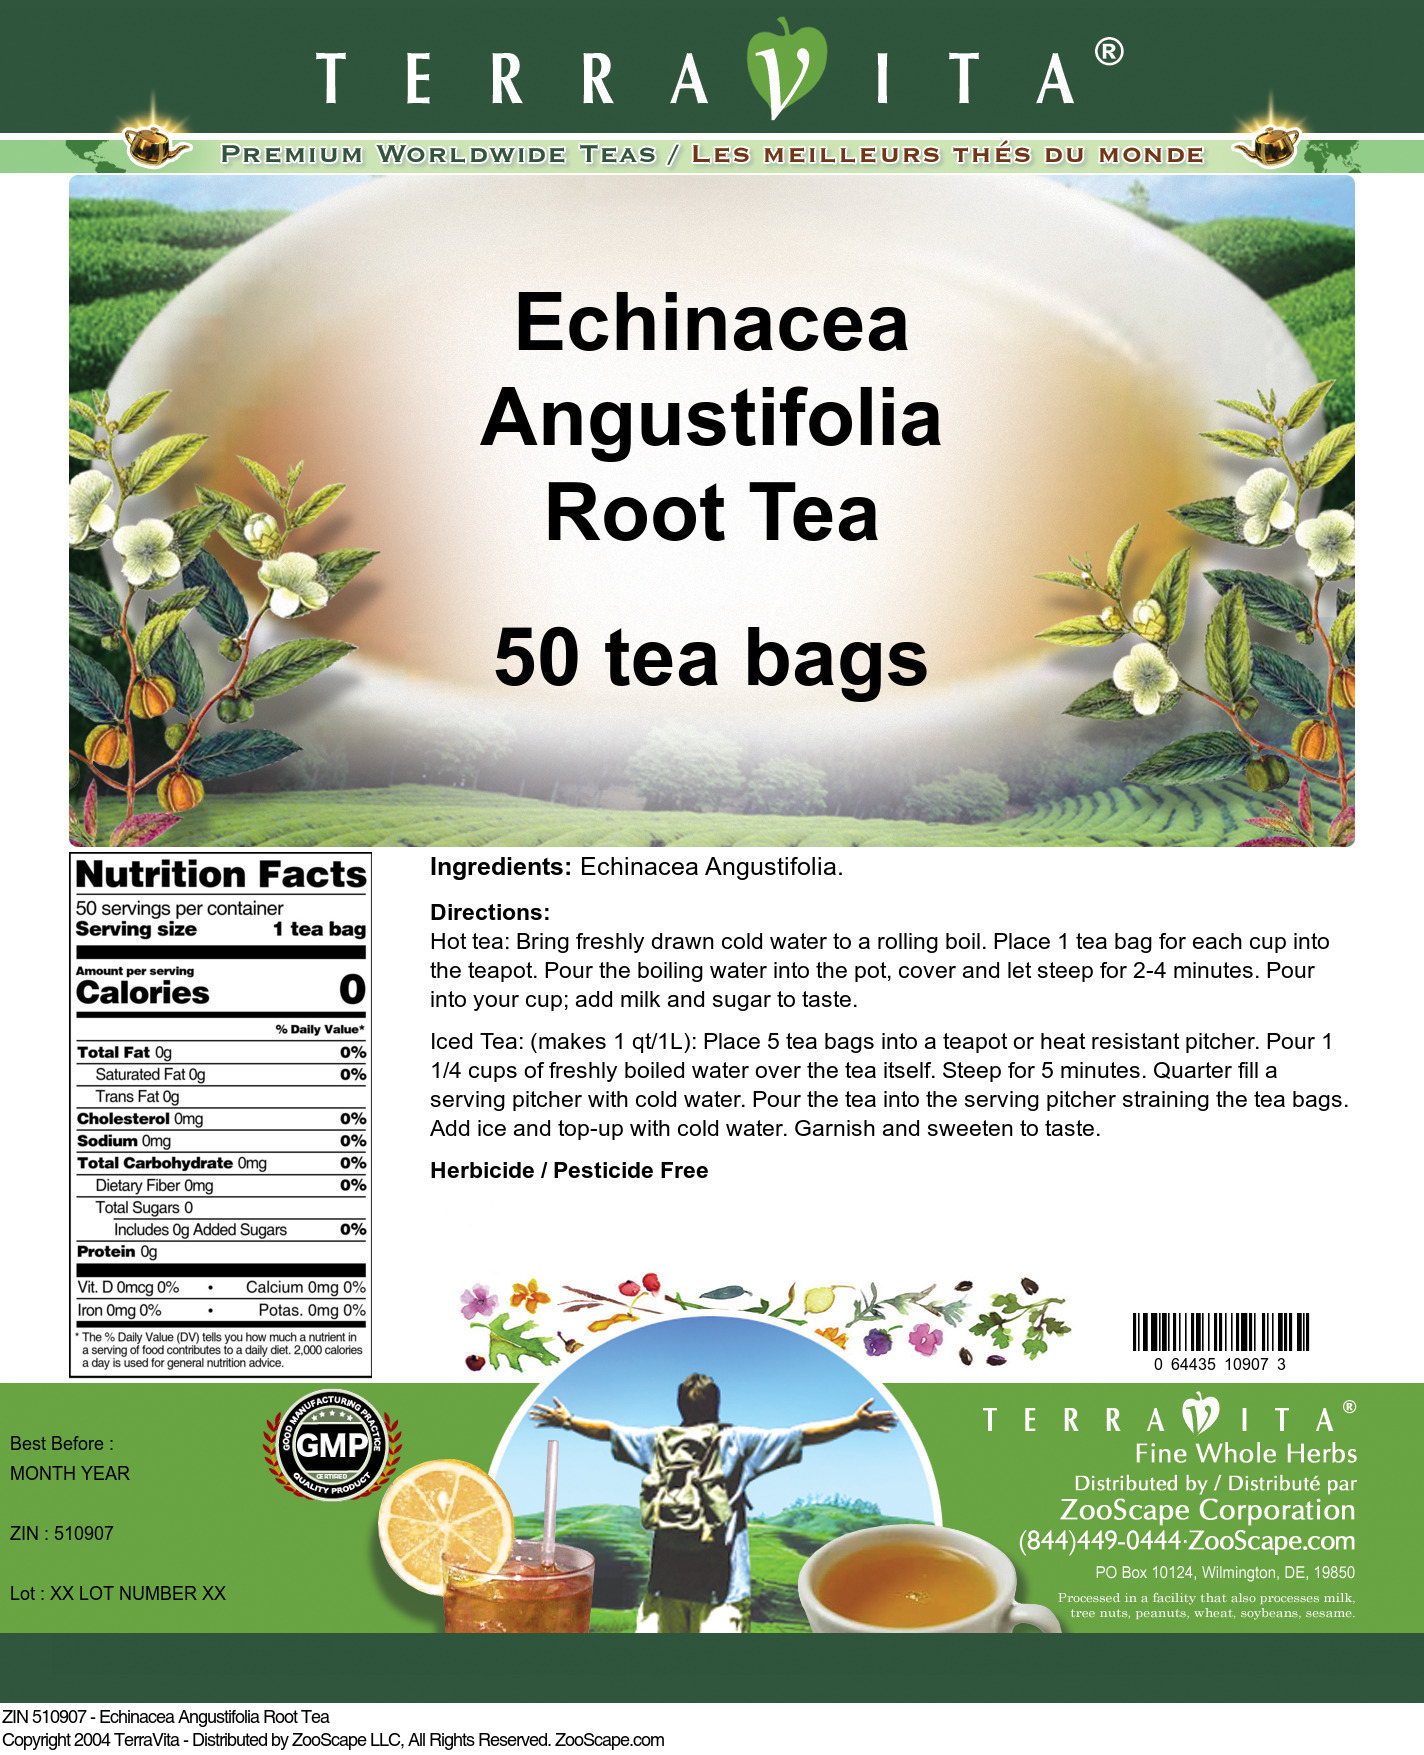 Echinacea Angustifolia Root Tea